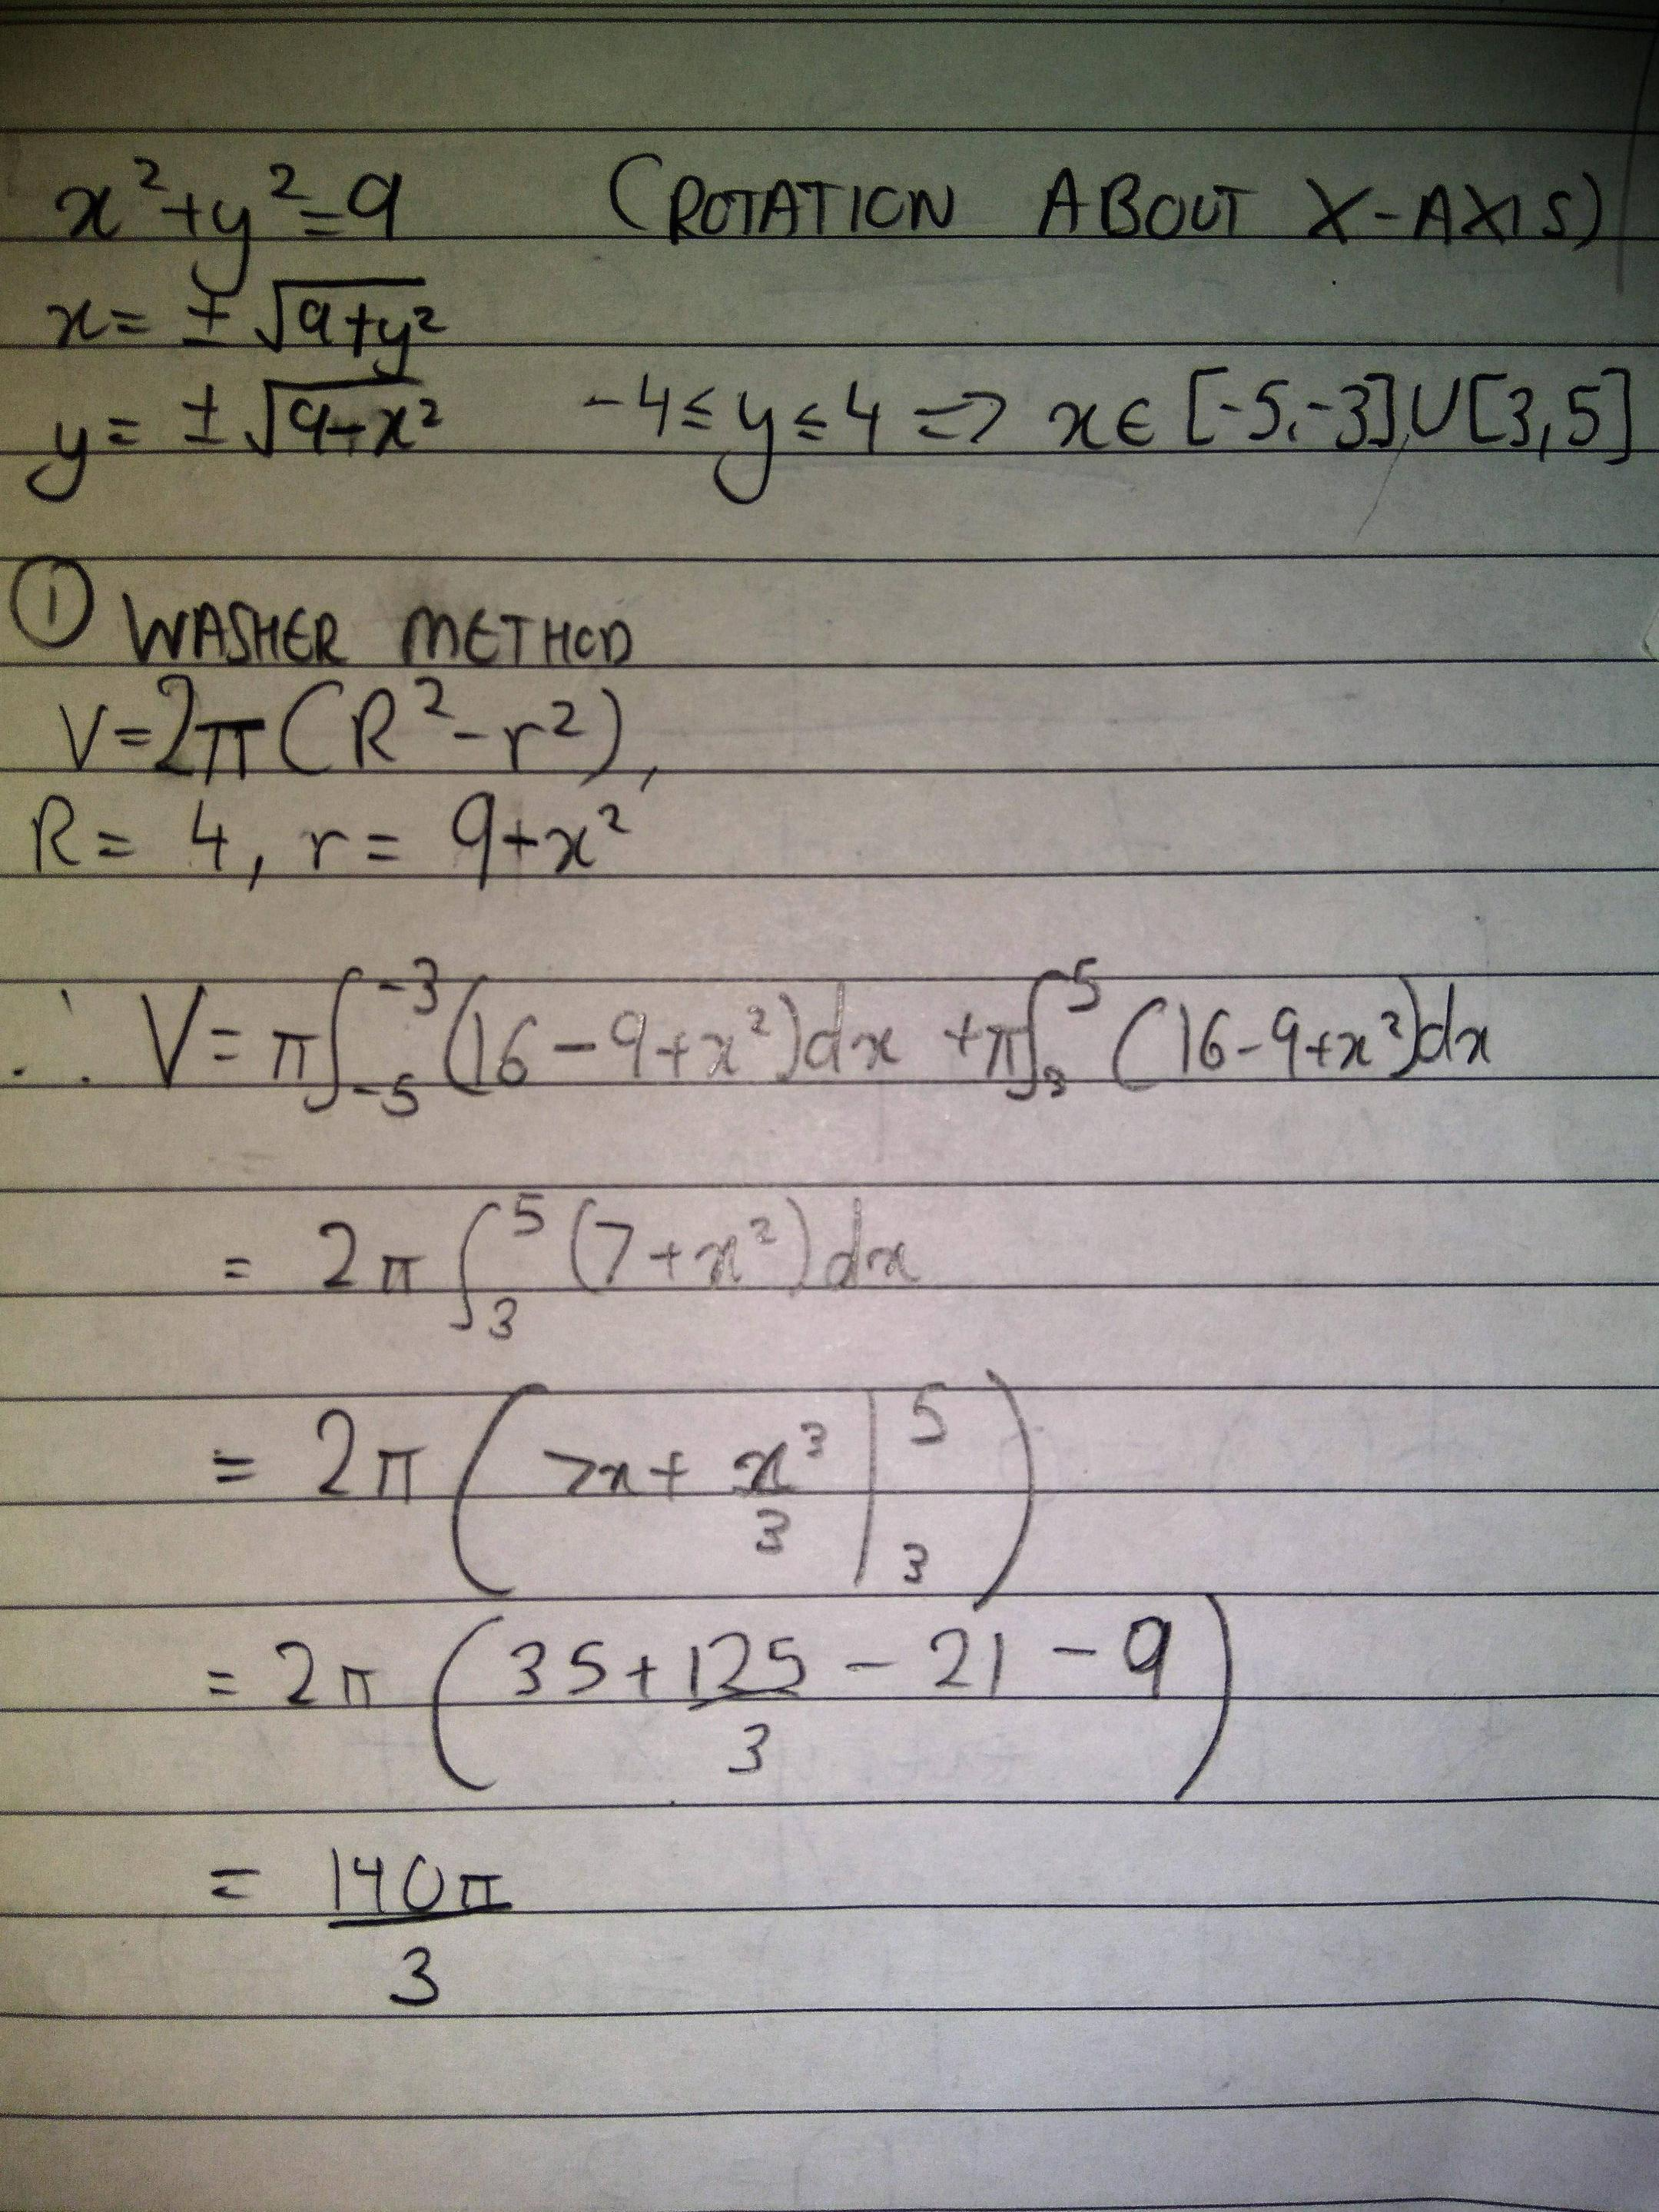 Washer Method Around X Axis